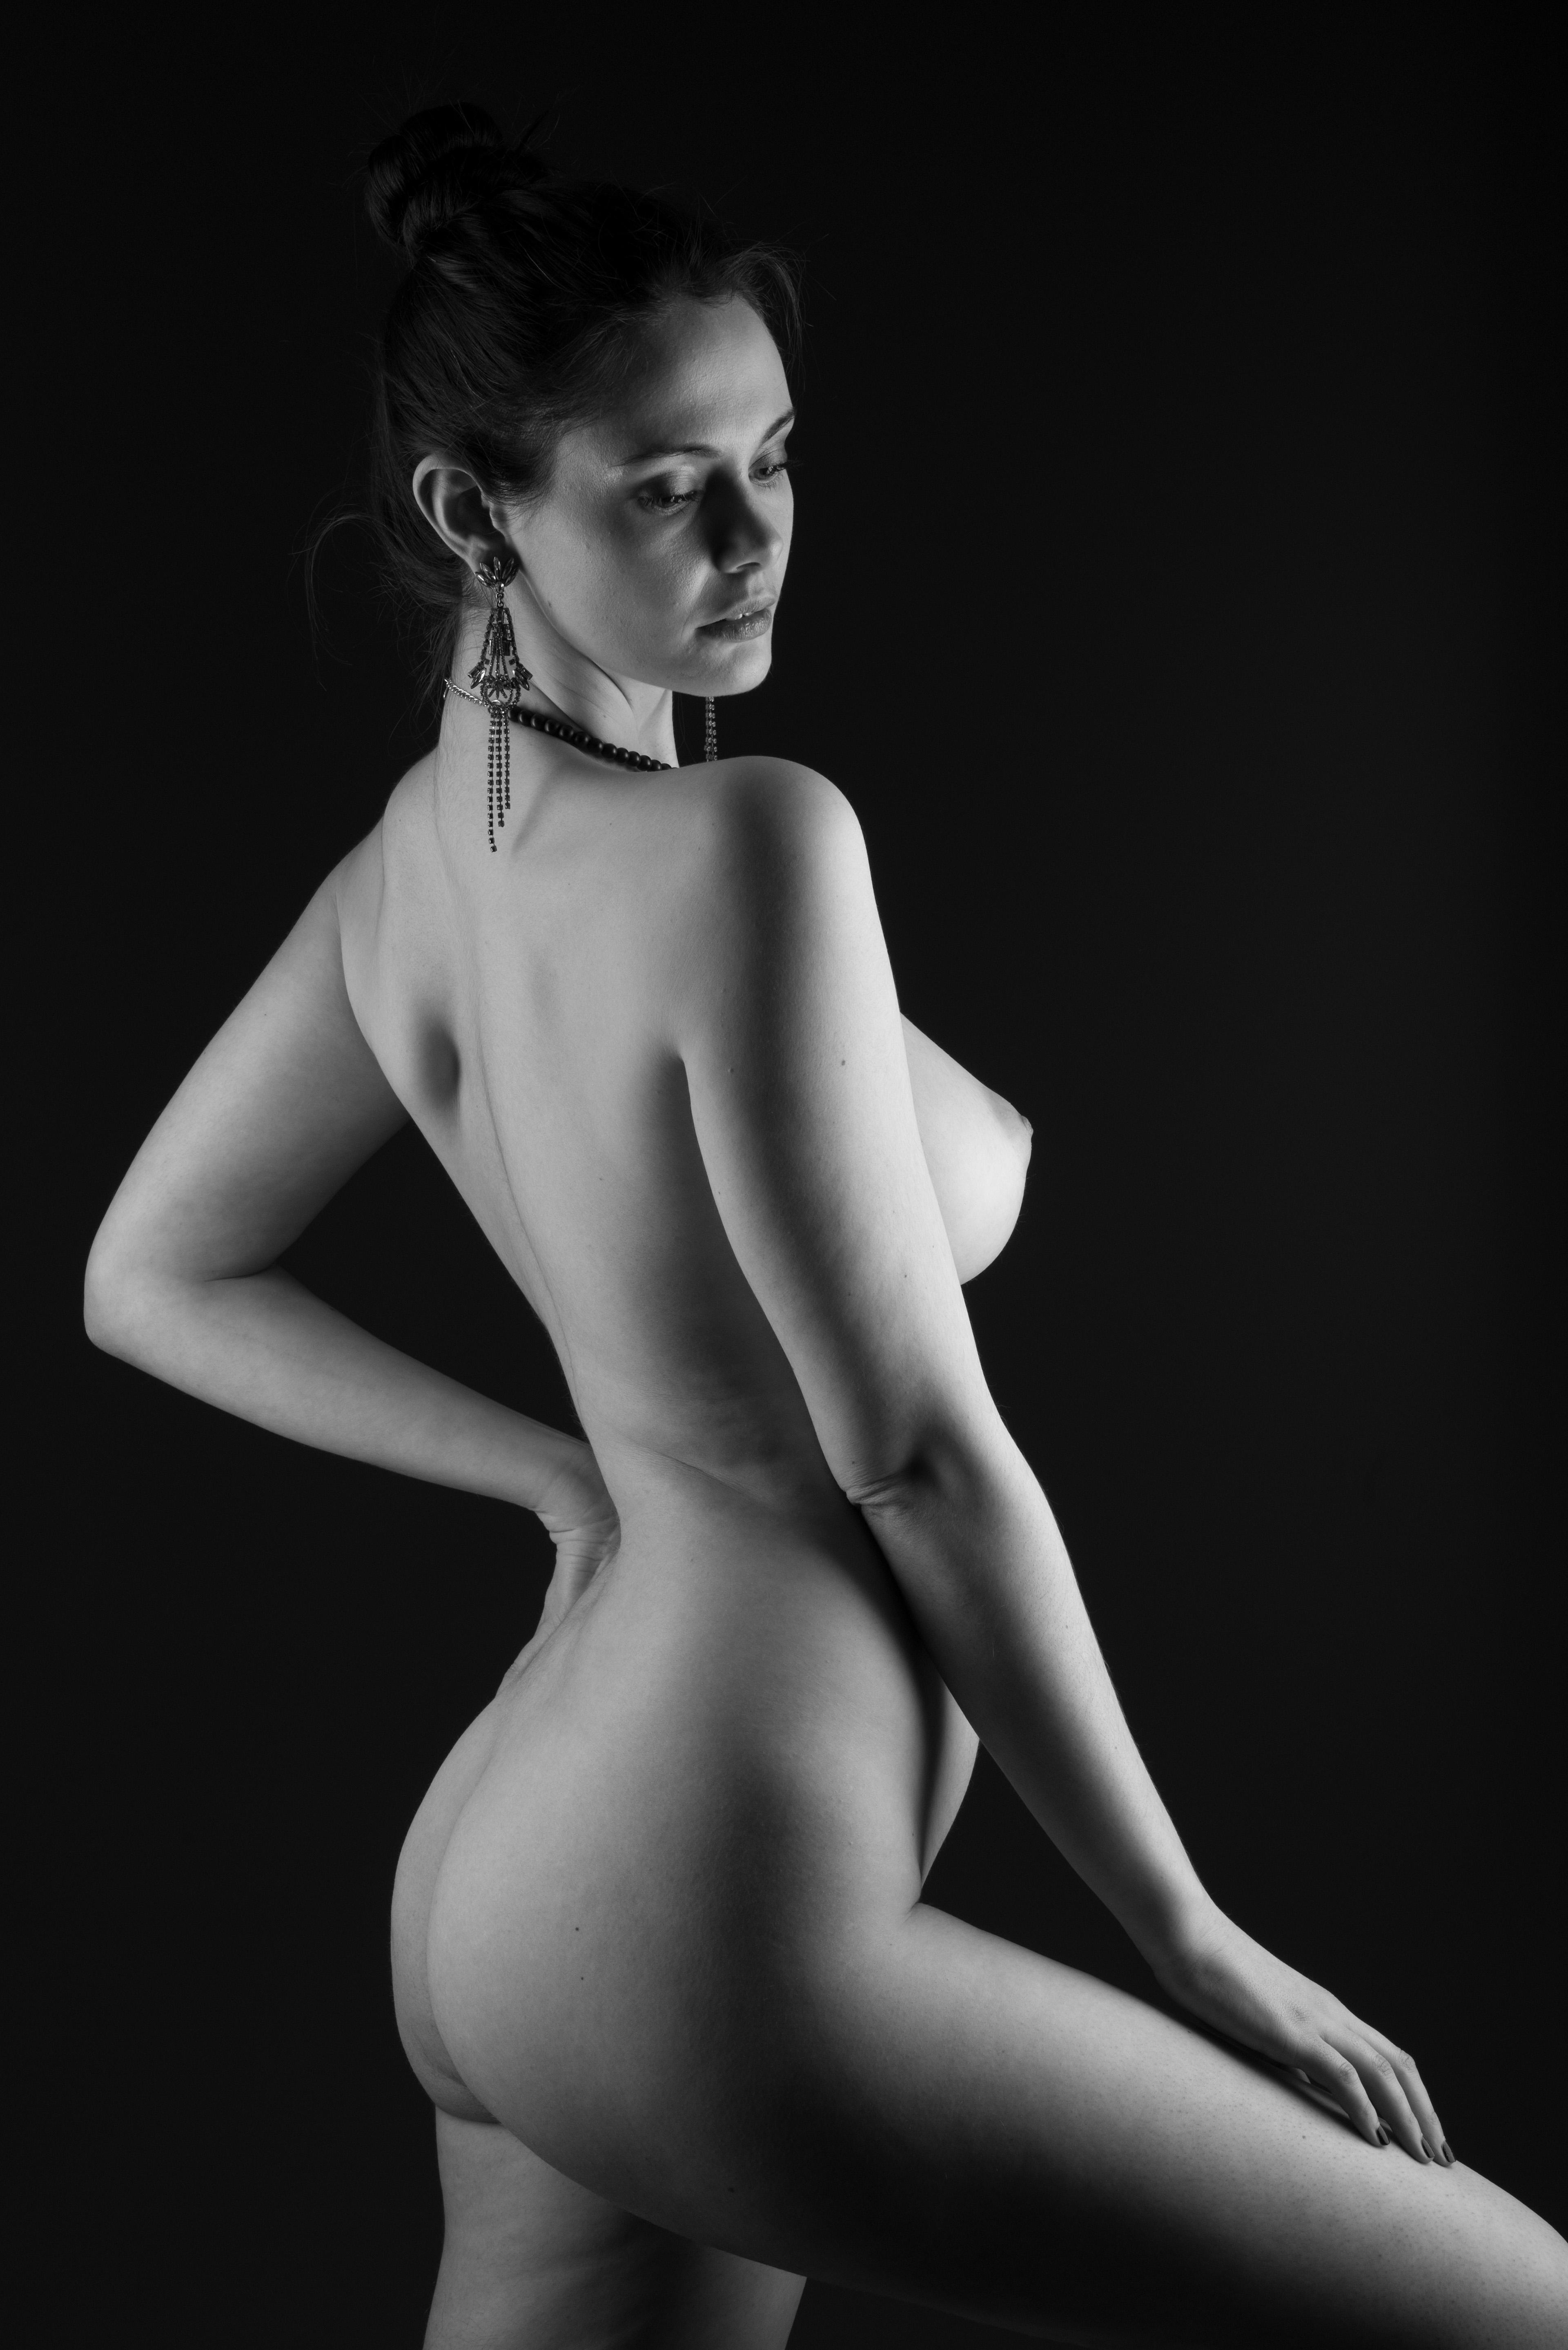 Jennifer aniston naked photo goes up for auction for coronavirus charity